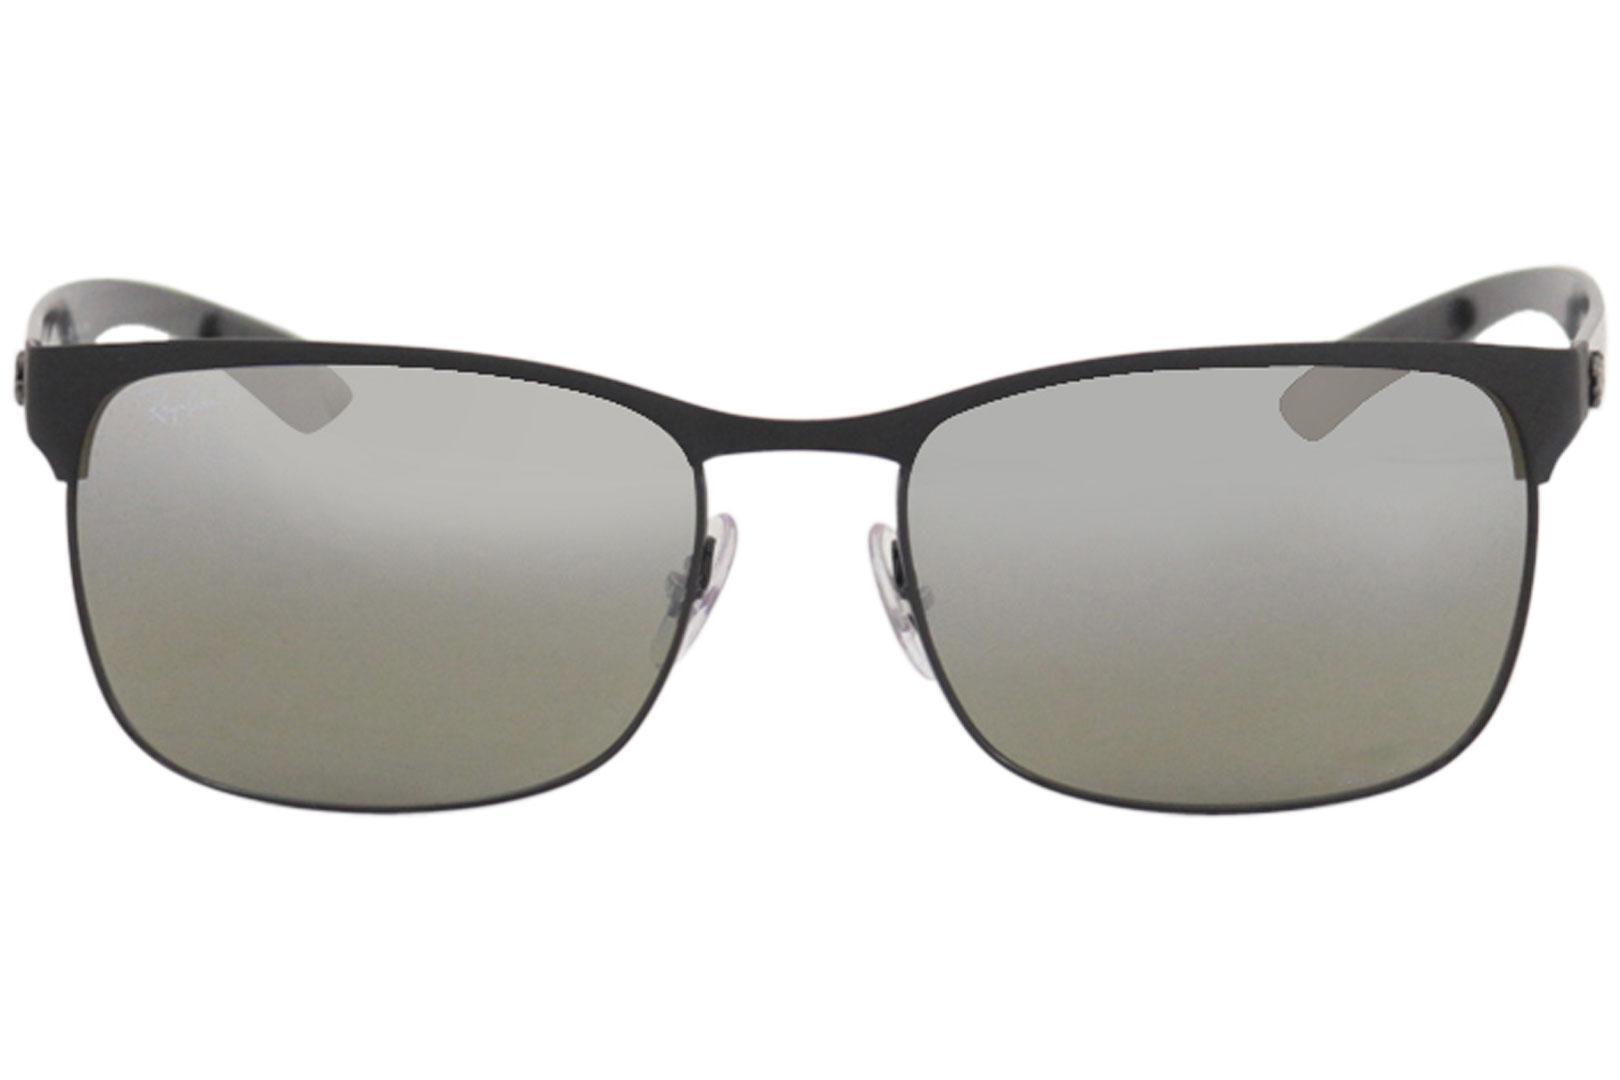 0240d811ae Ray Ban Men s Chromance RB8319CH 8319 Rectangle RayBan Polarized Sunglasses  by Ray Ban. 123456